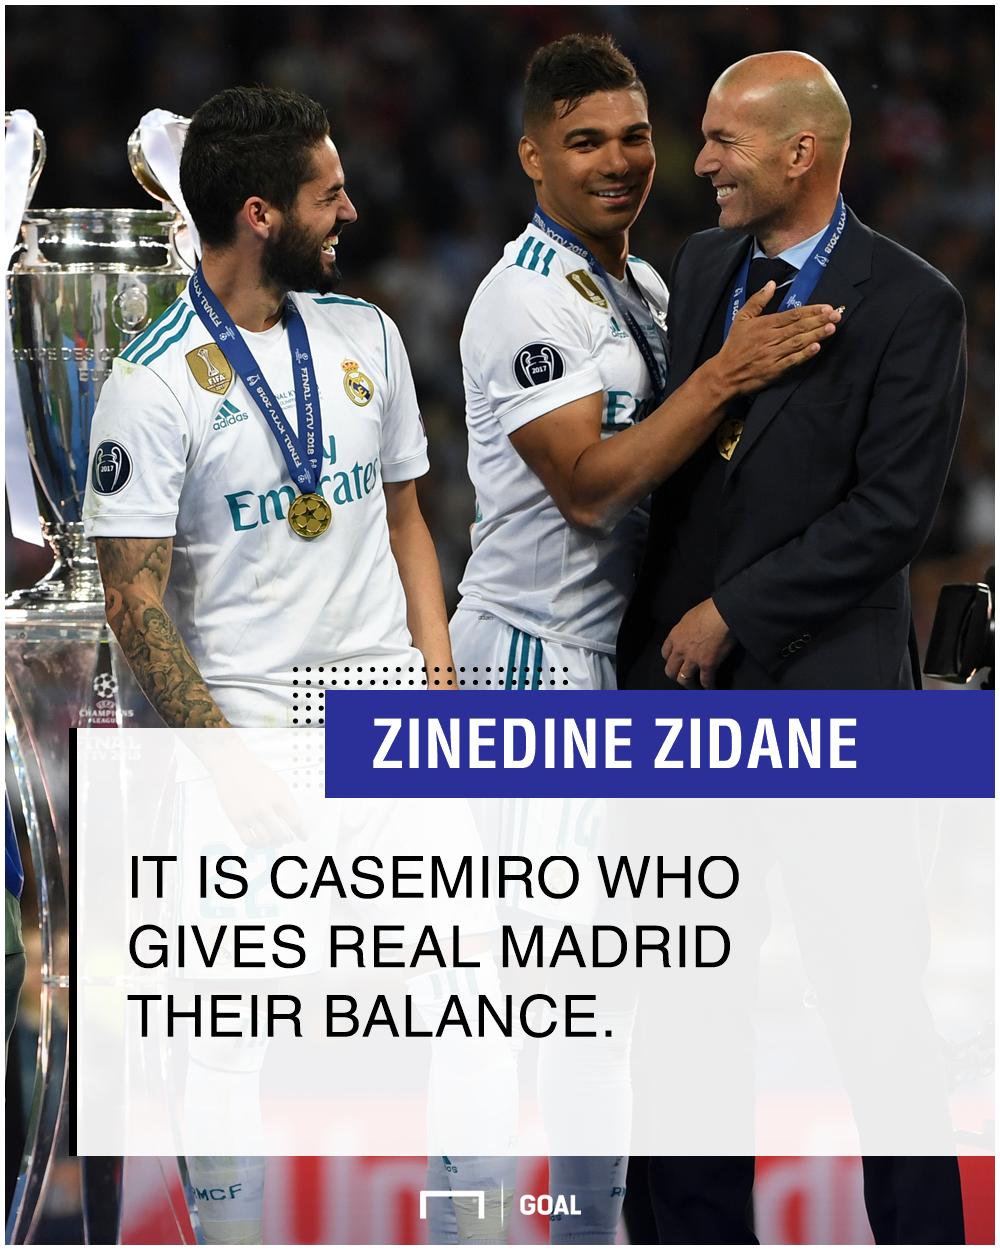 Zidane Casemiro GFX